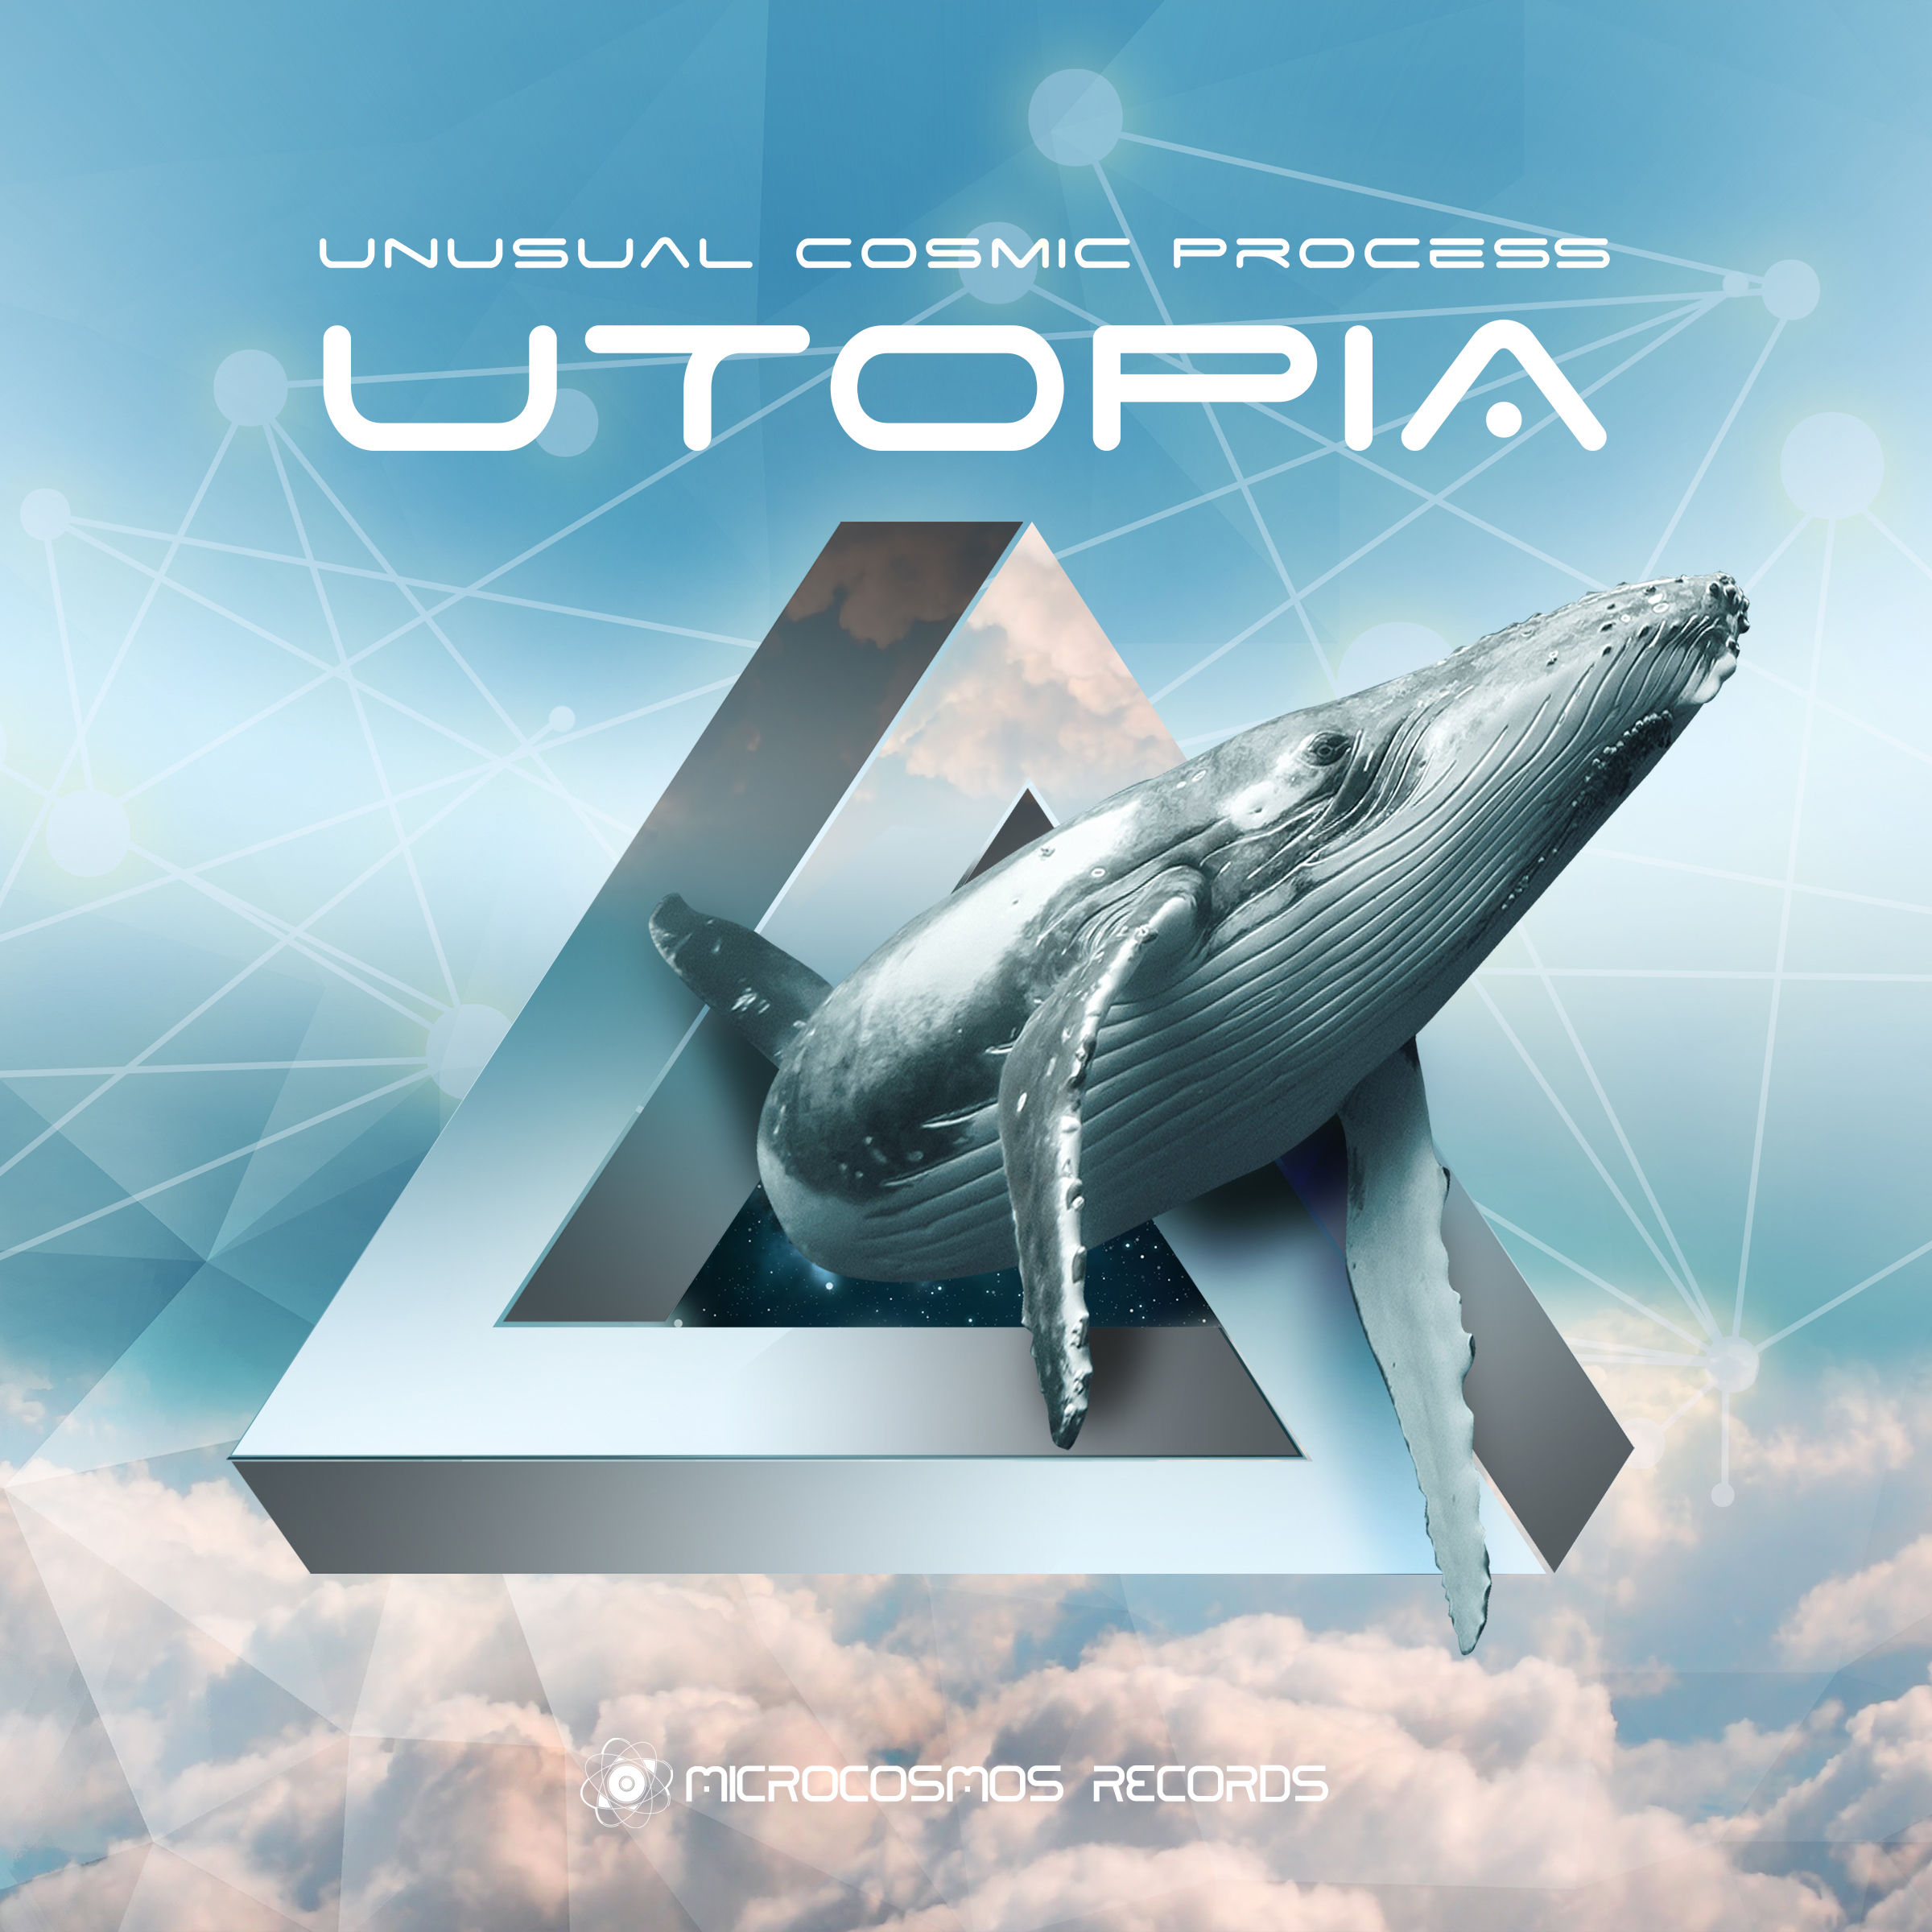 Unusual Cosmic Process — Utopia